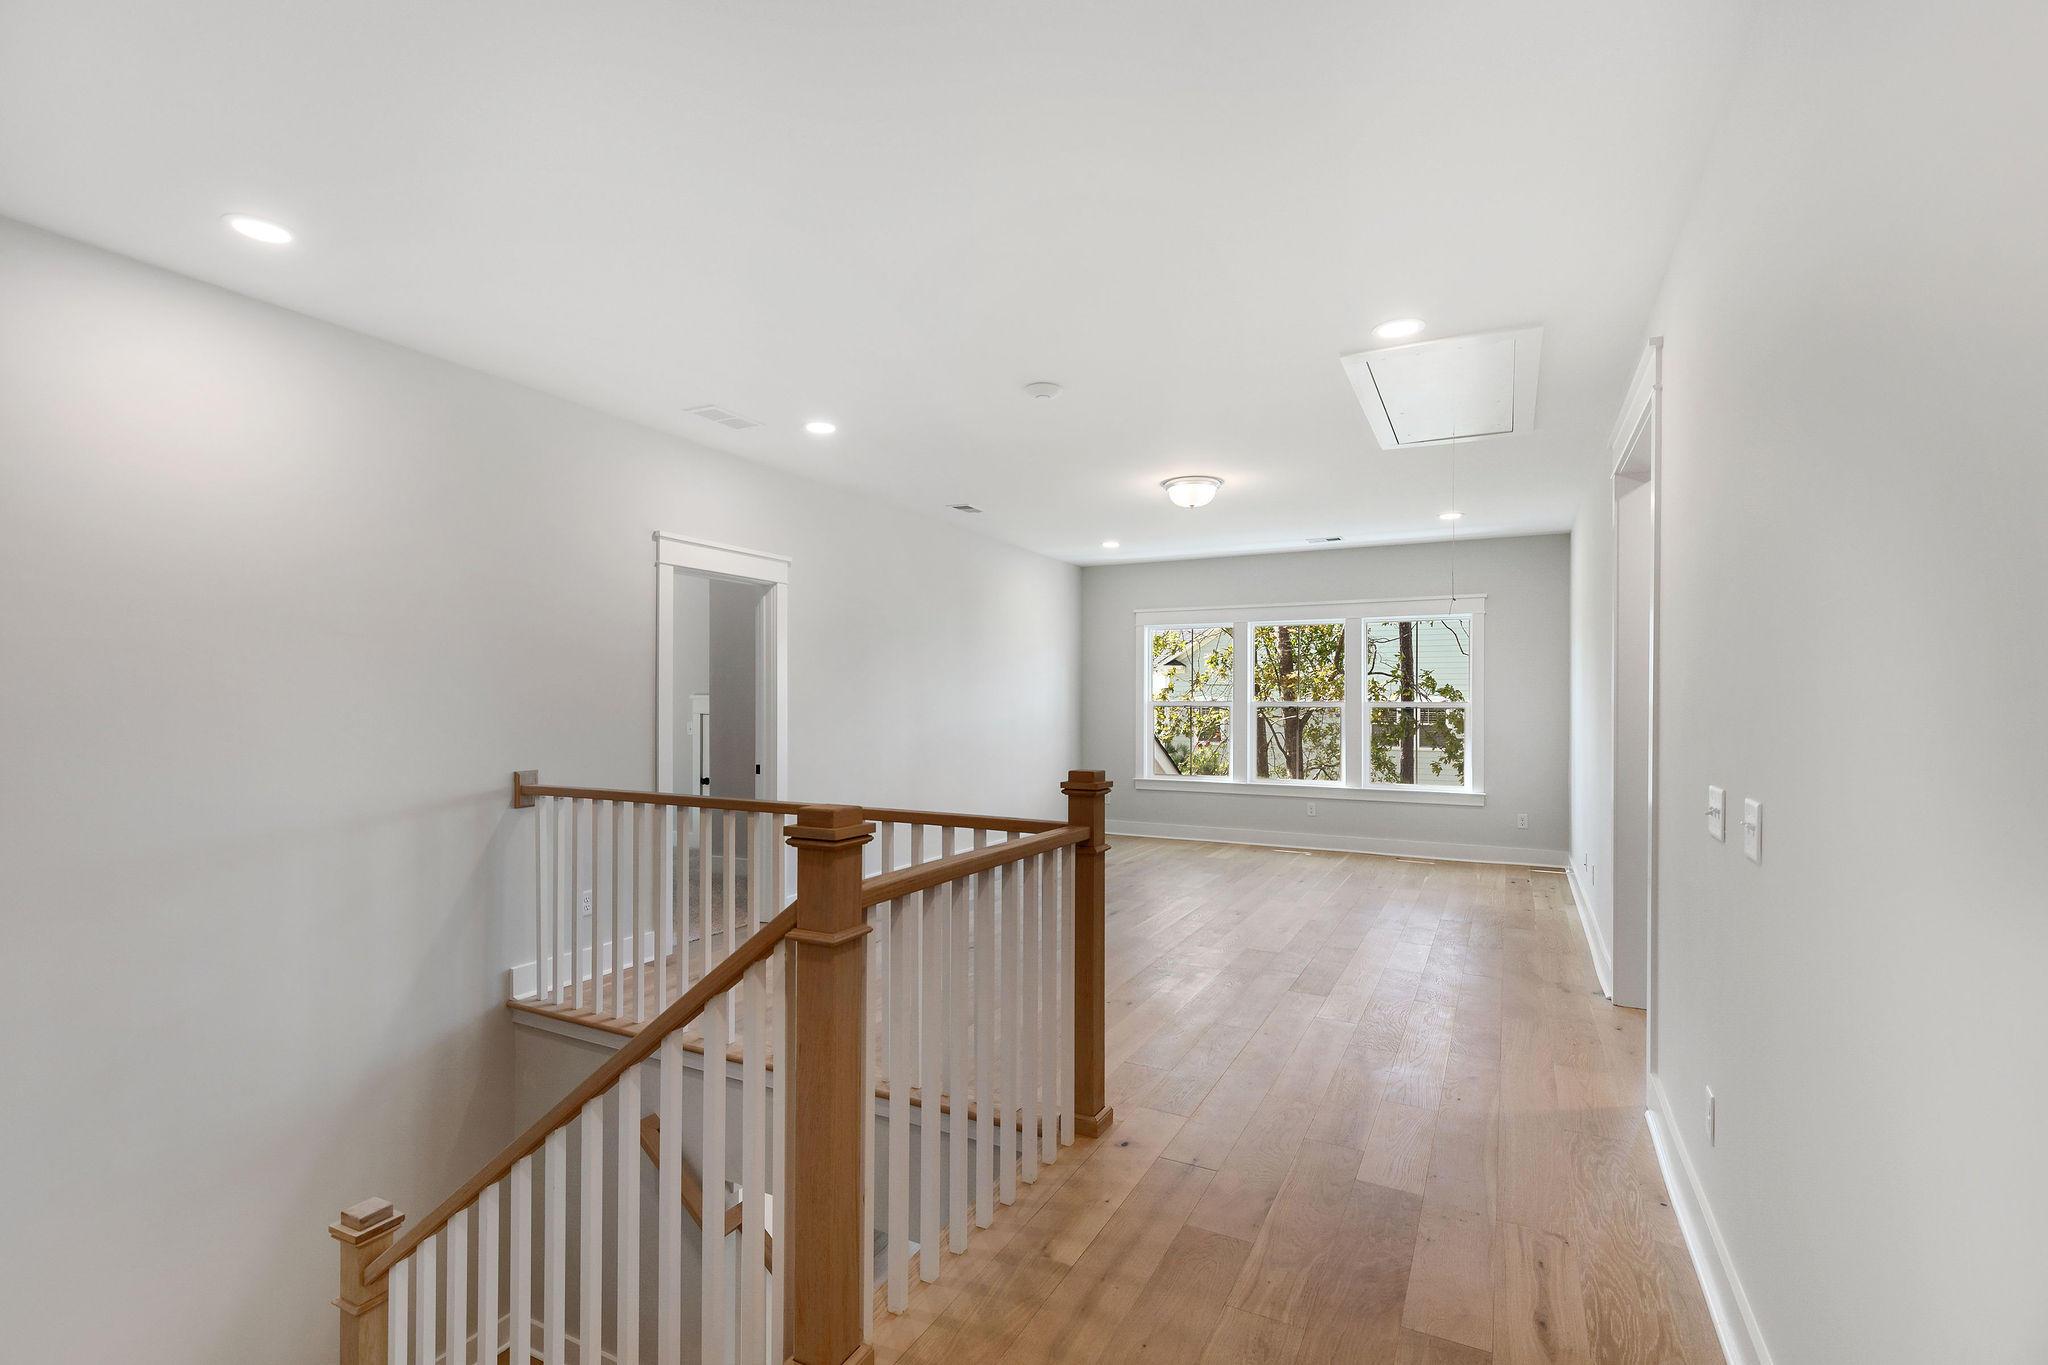 Park West Homes For Sale - 2291 Middlesex, Mount Pleasant, SC - 17